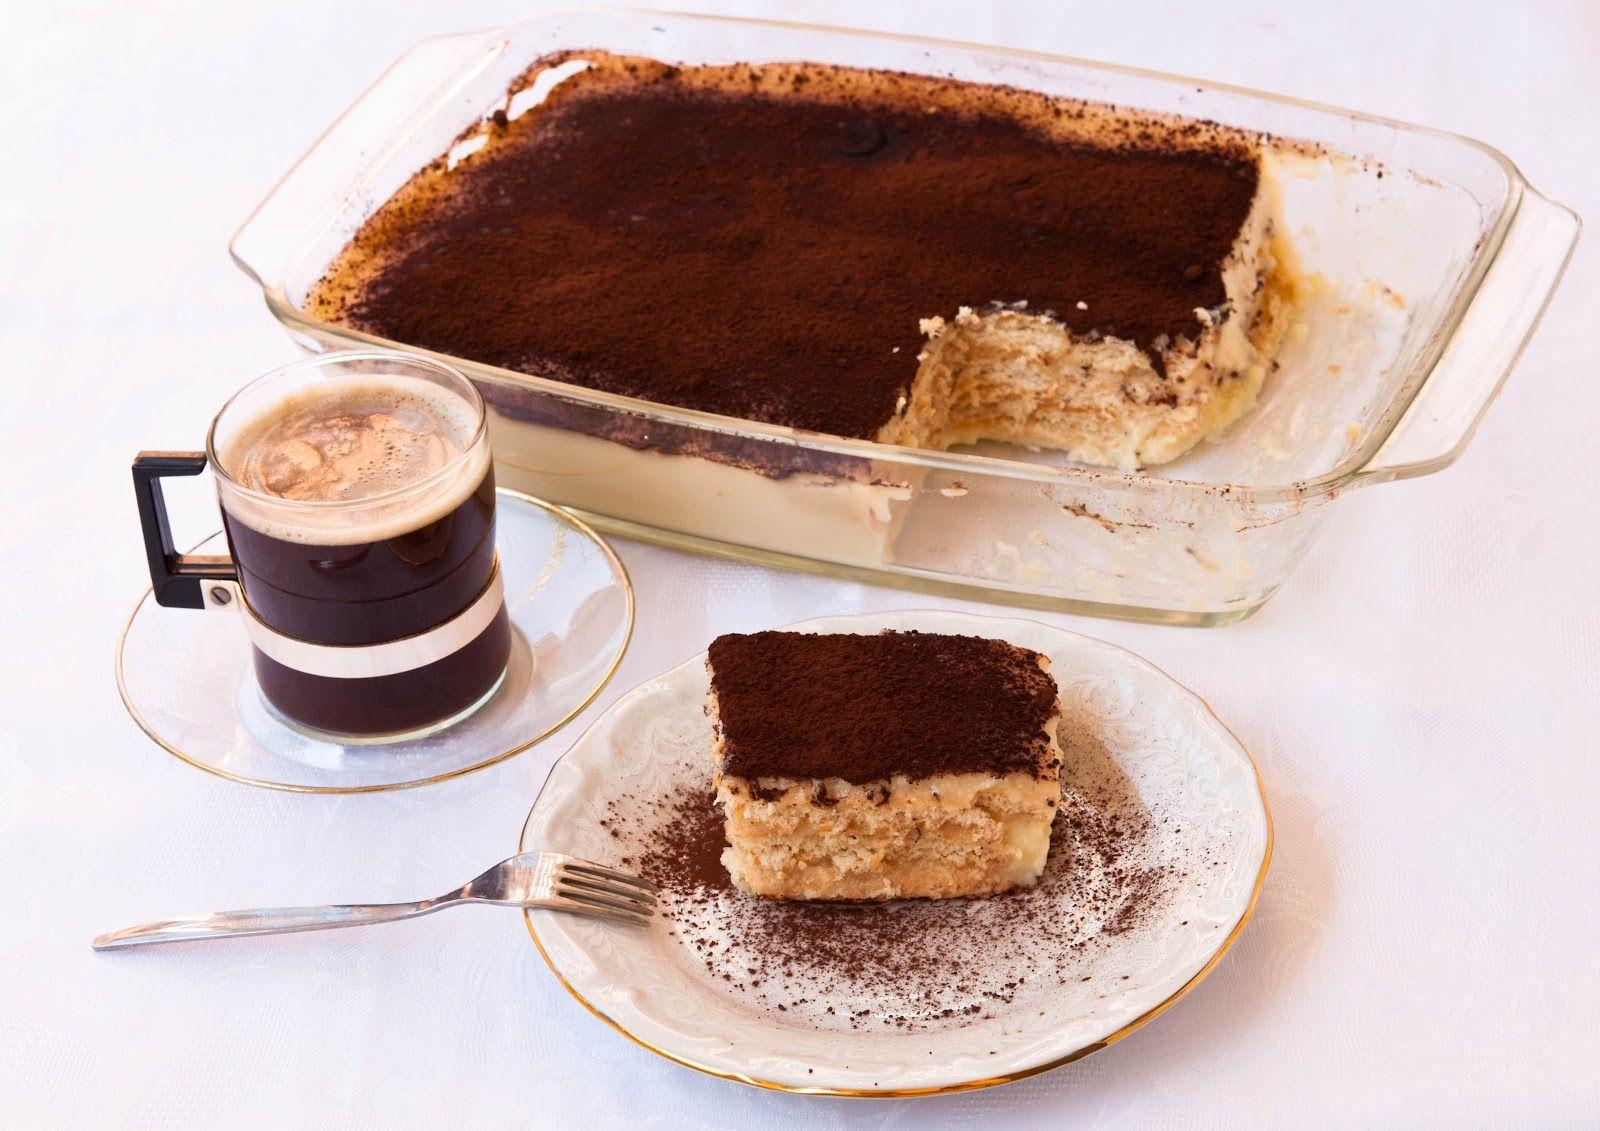 Bulgarian Biscuit cake - Бисквитена торта